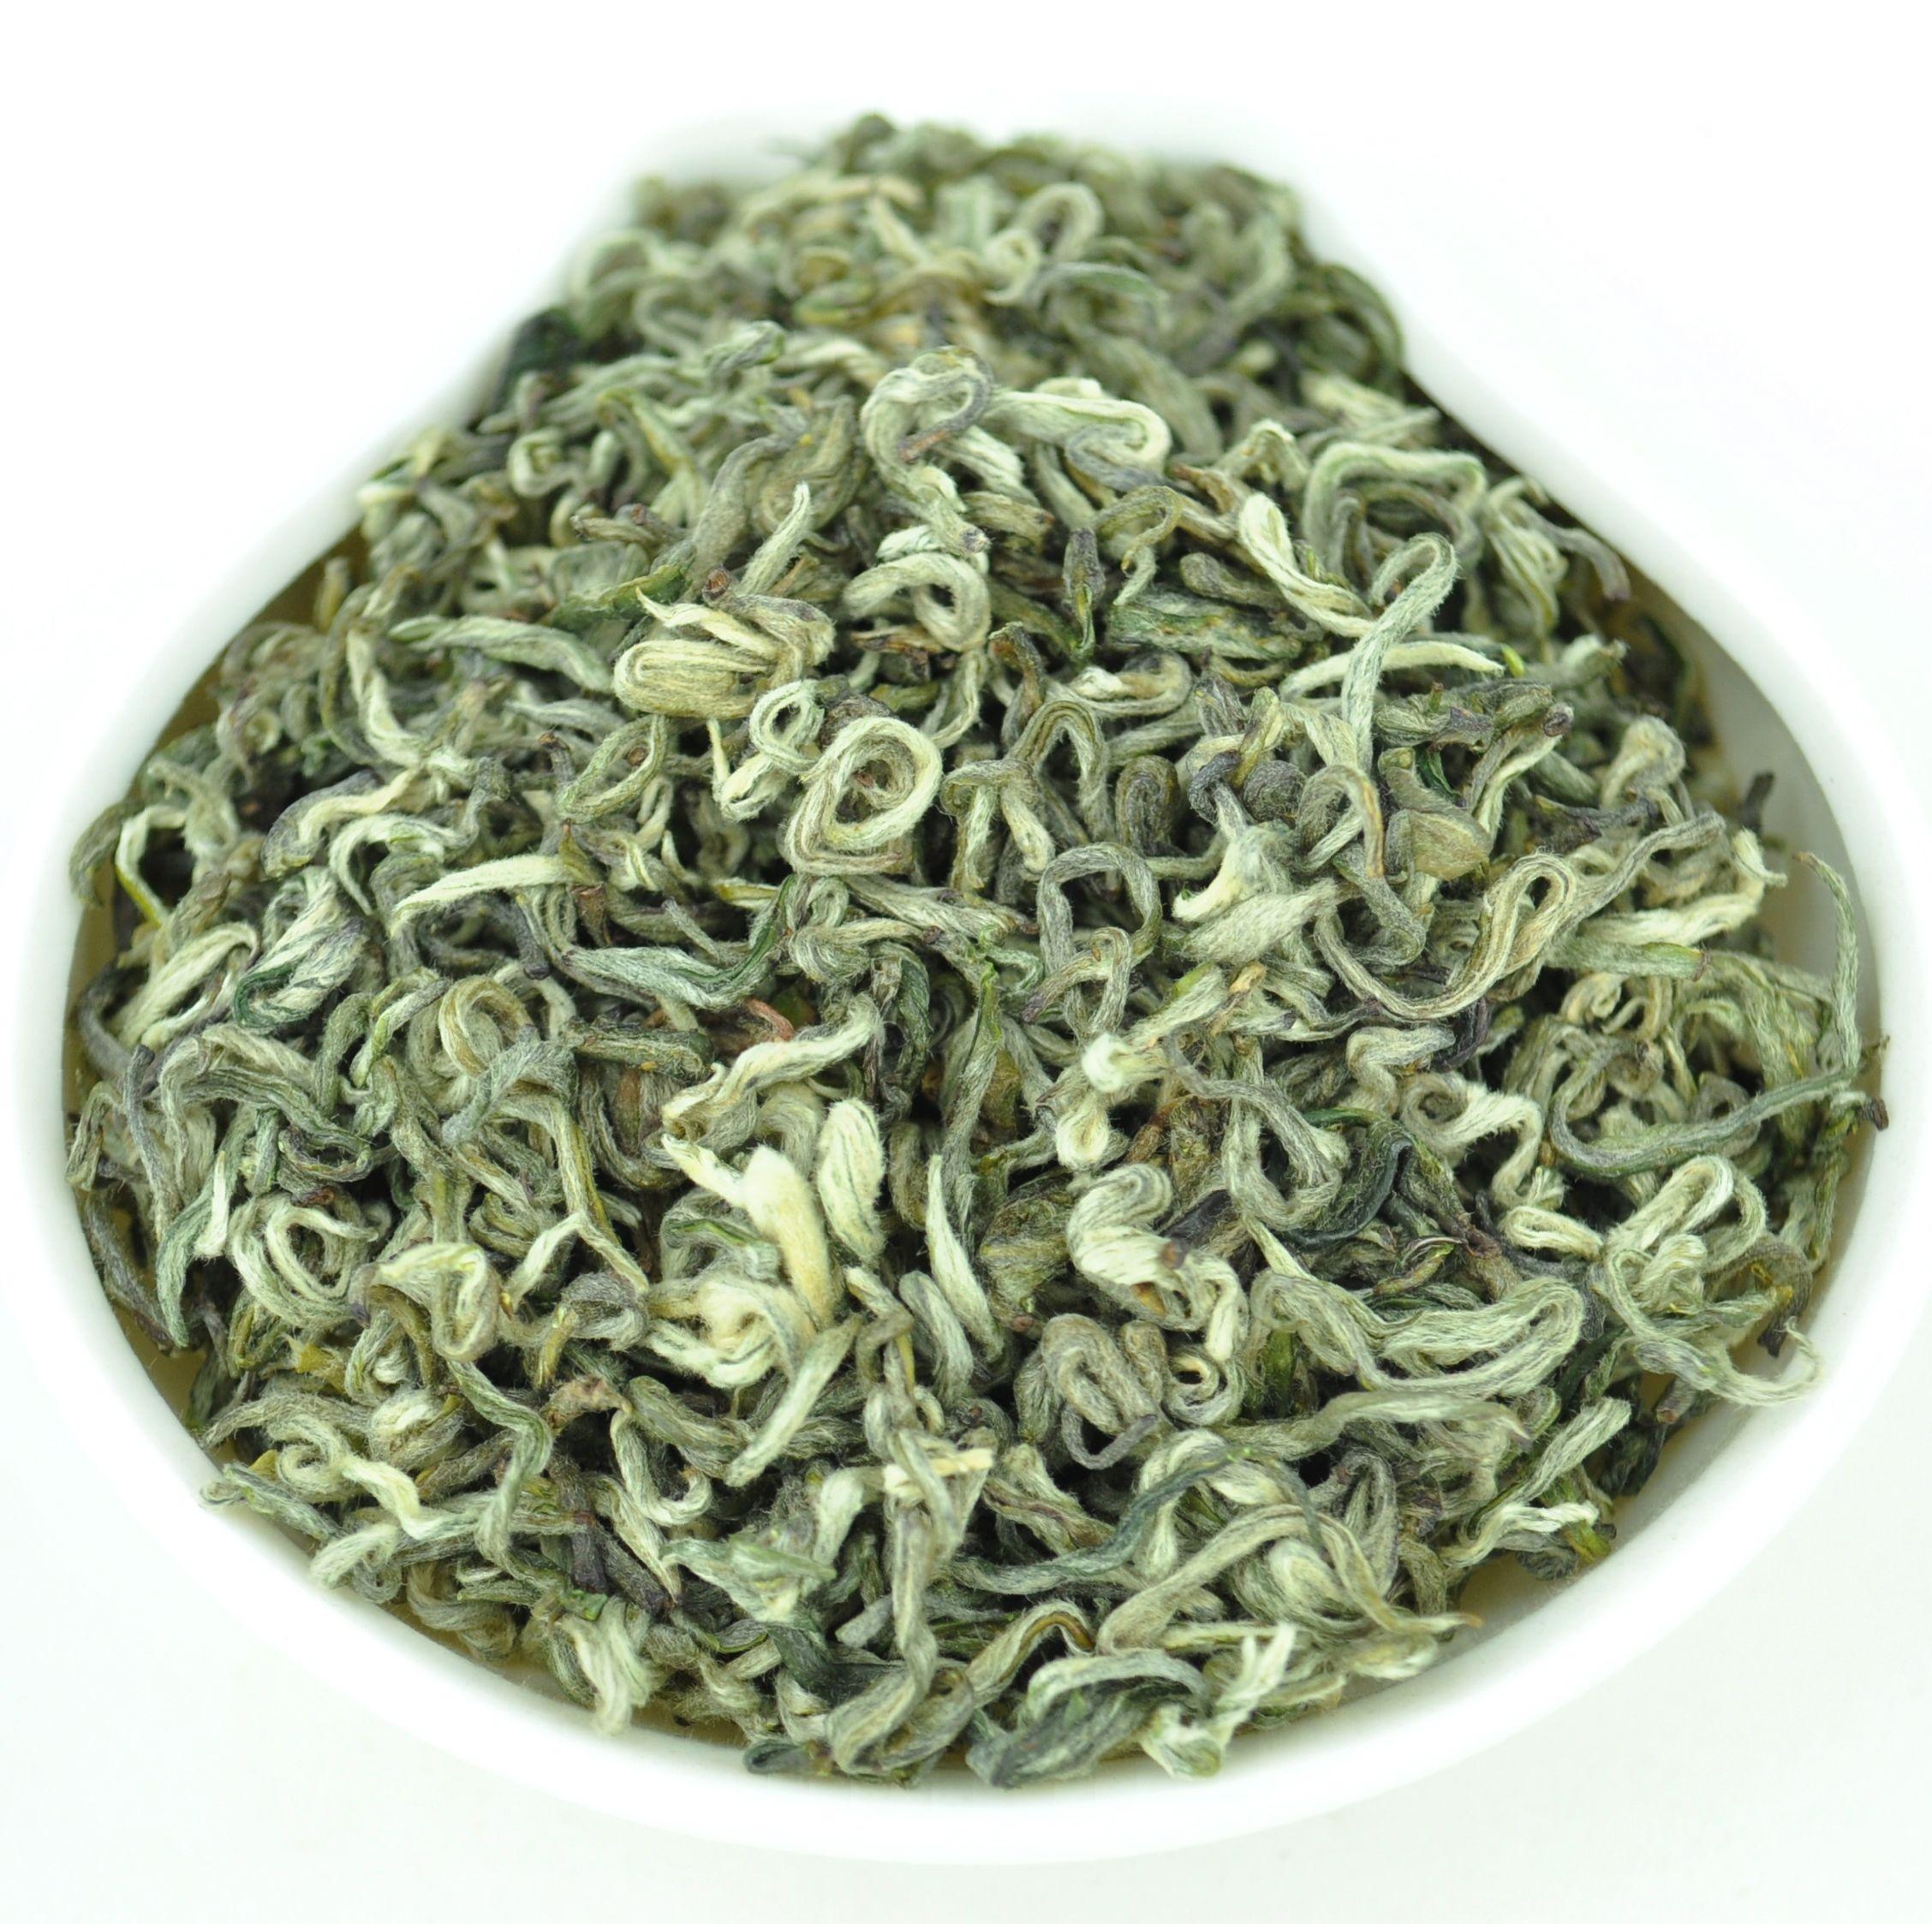 Imperial Yunnan Dong Ting Bi Luo Chun White tea * Spring 2016